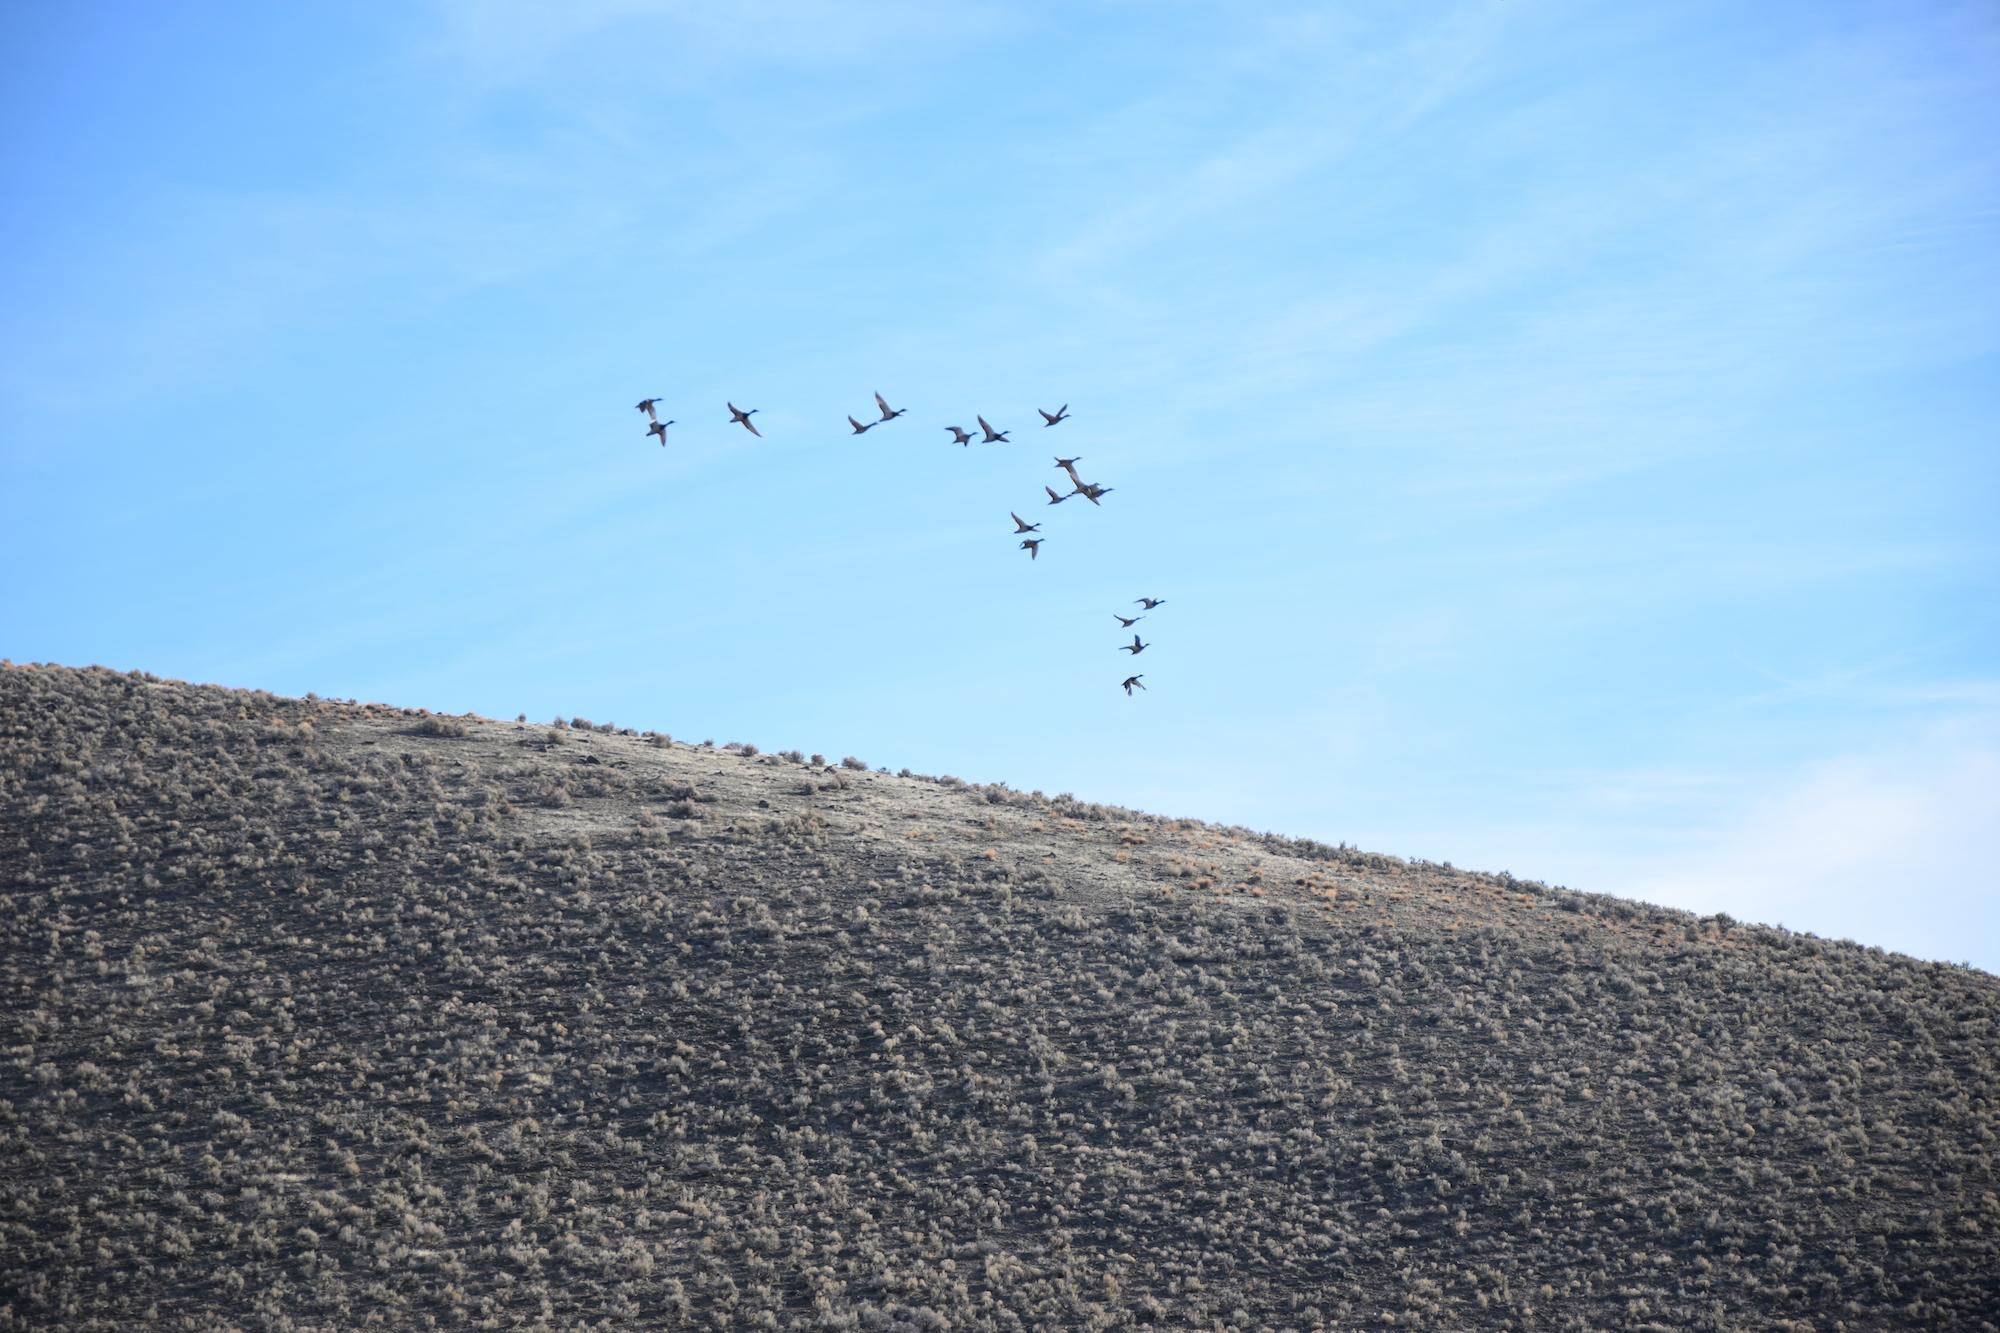 Birds take to the air near Thacker Pass